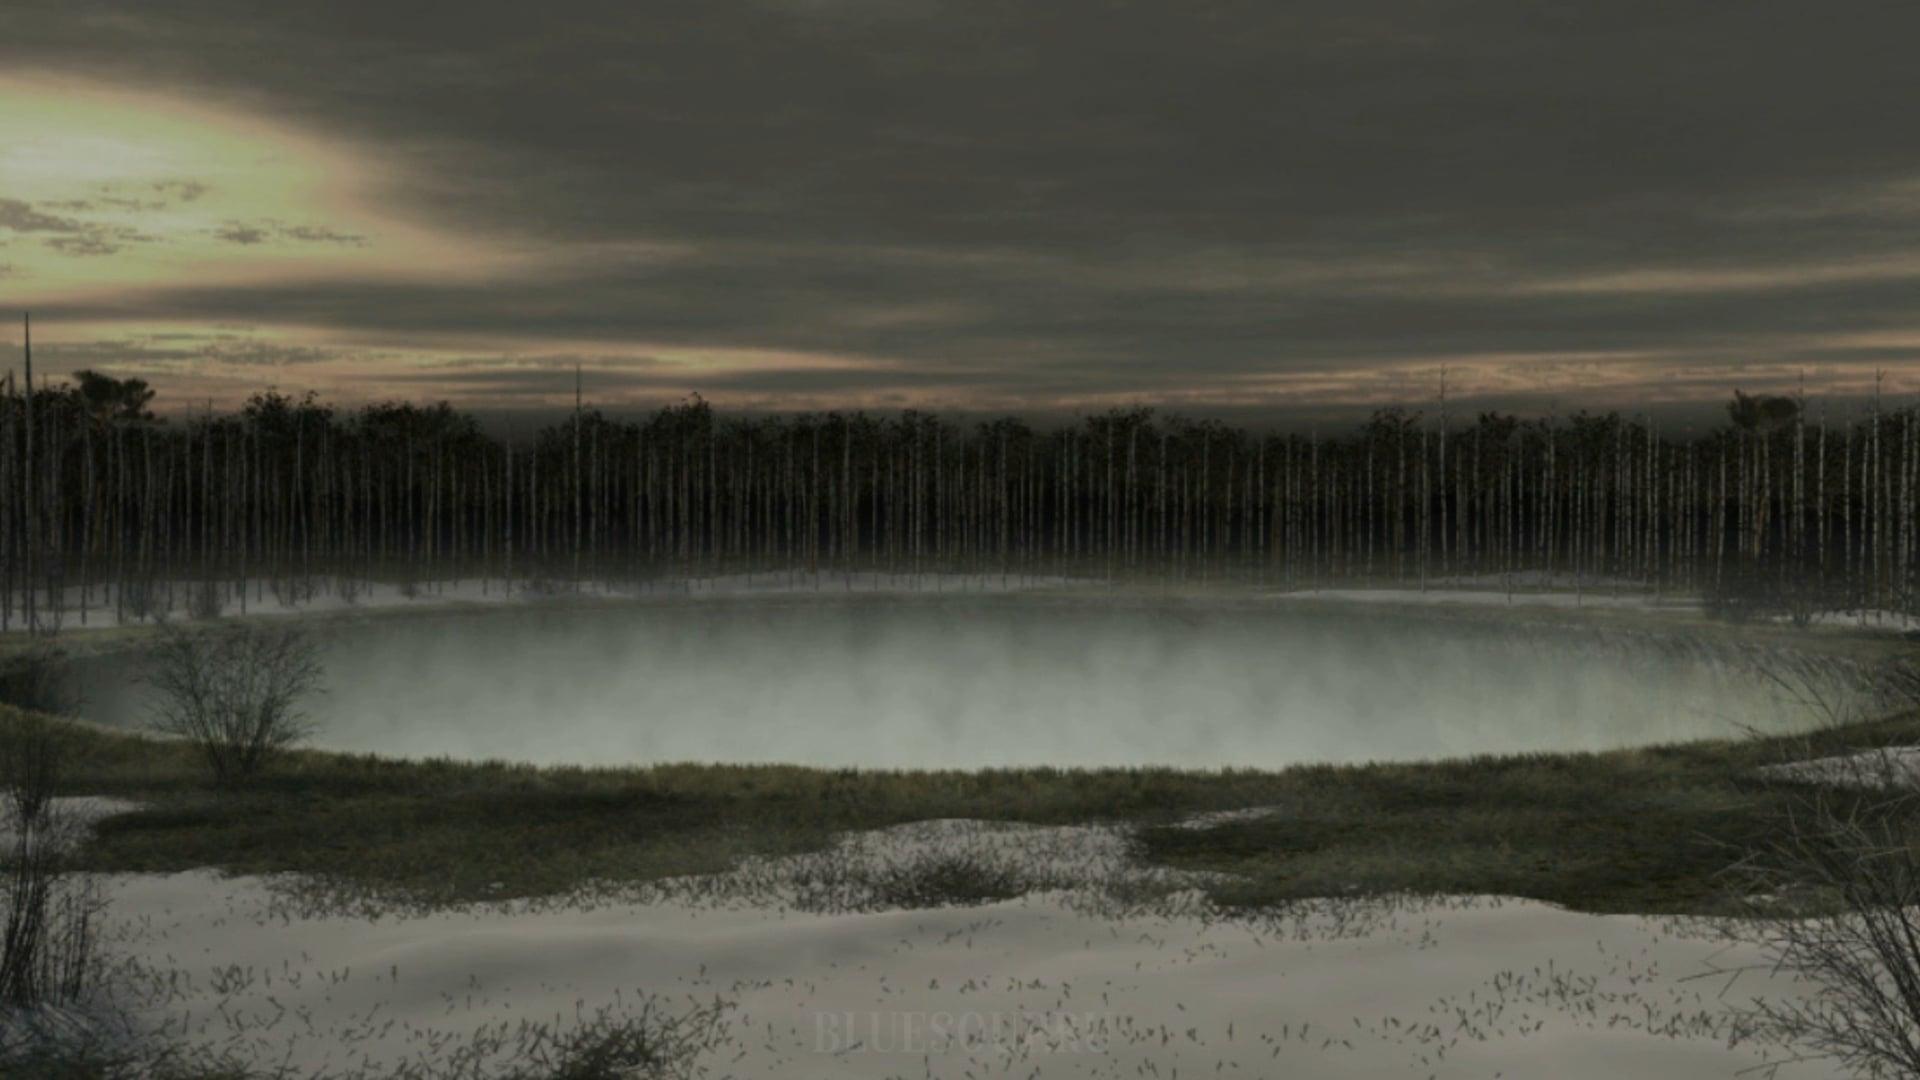 ОЗЕРО / THE LAKE / 2007